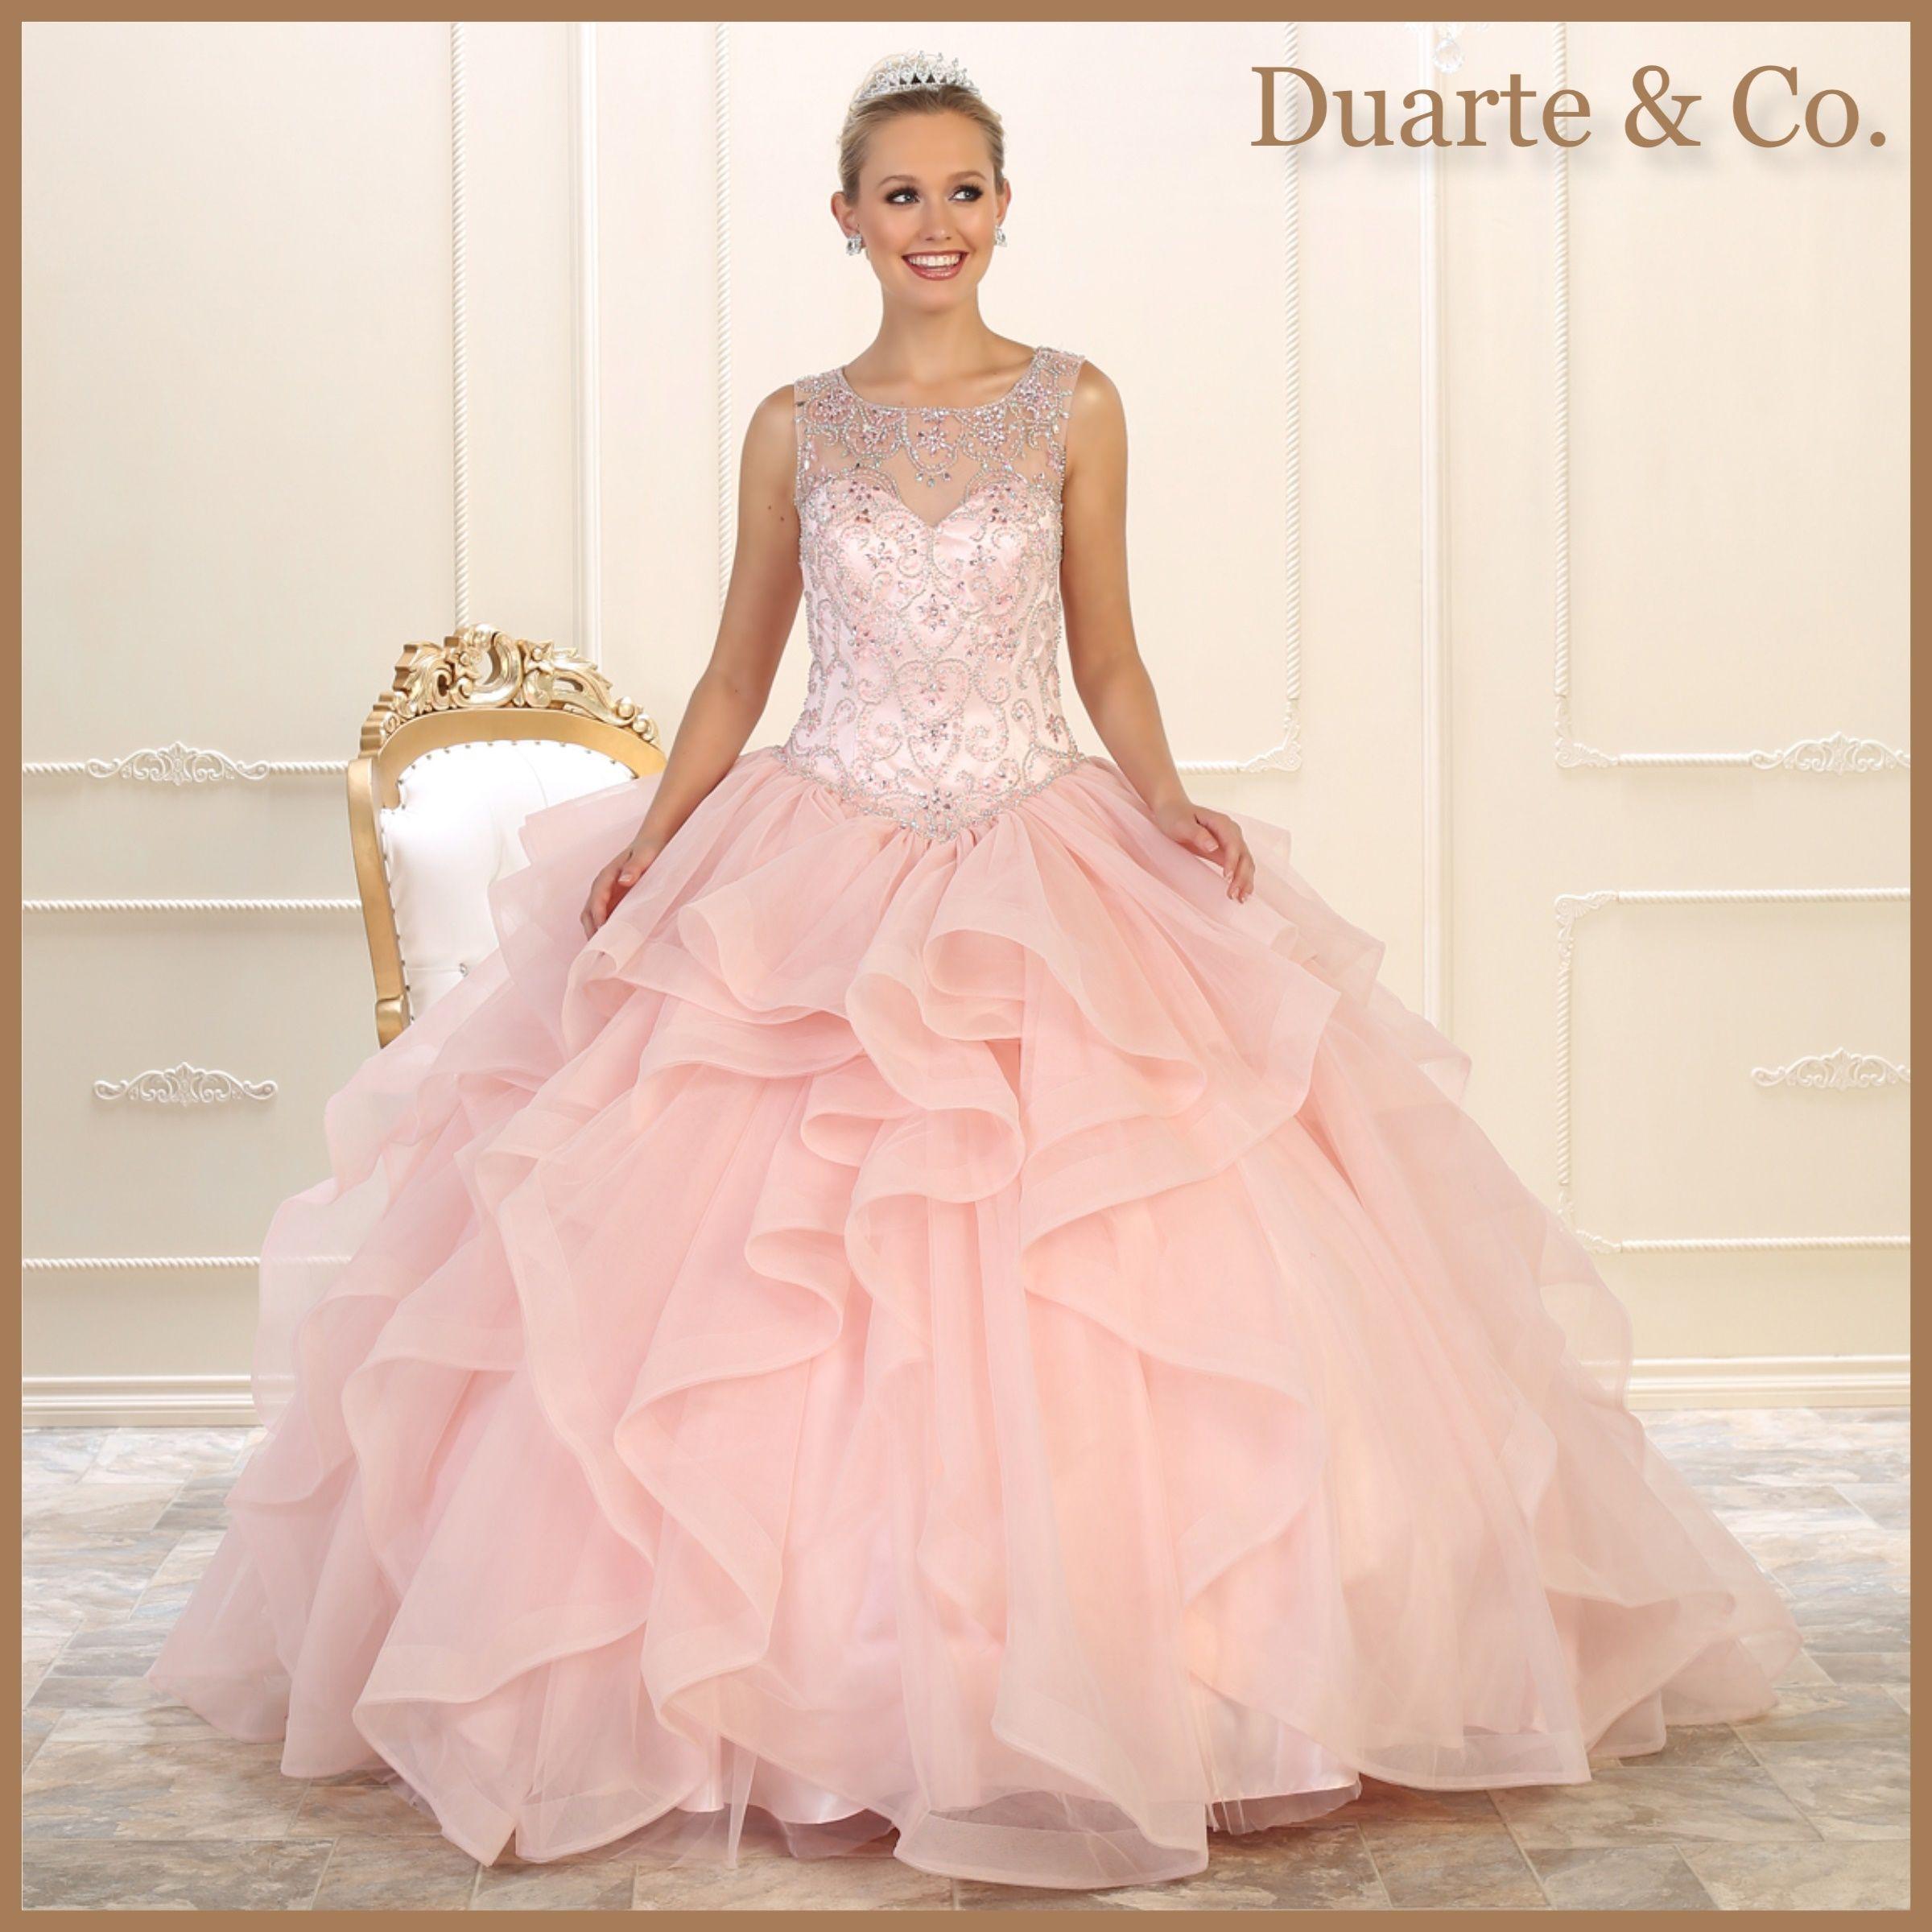 Sleeveless Quinceanera/Sweet 16 Gown- LK105 | Best Ones | Pinterest ...